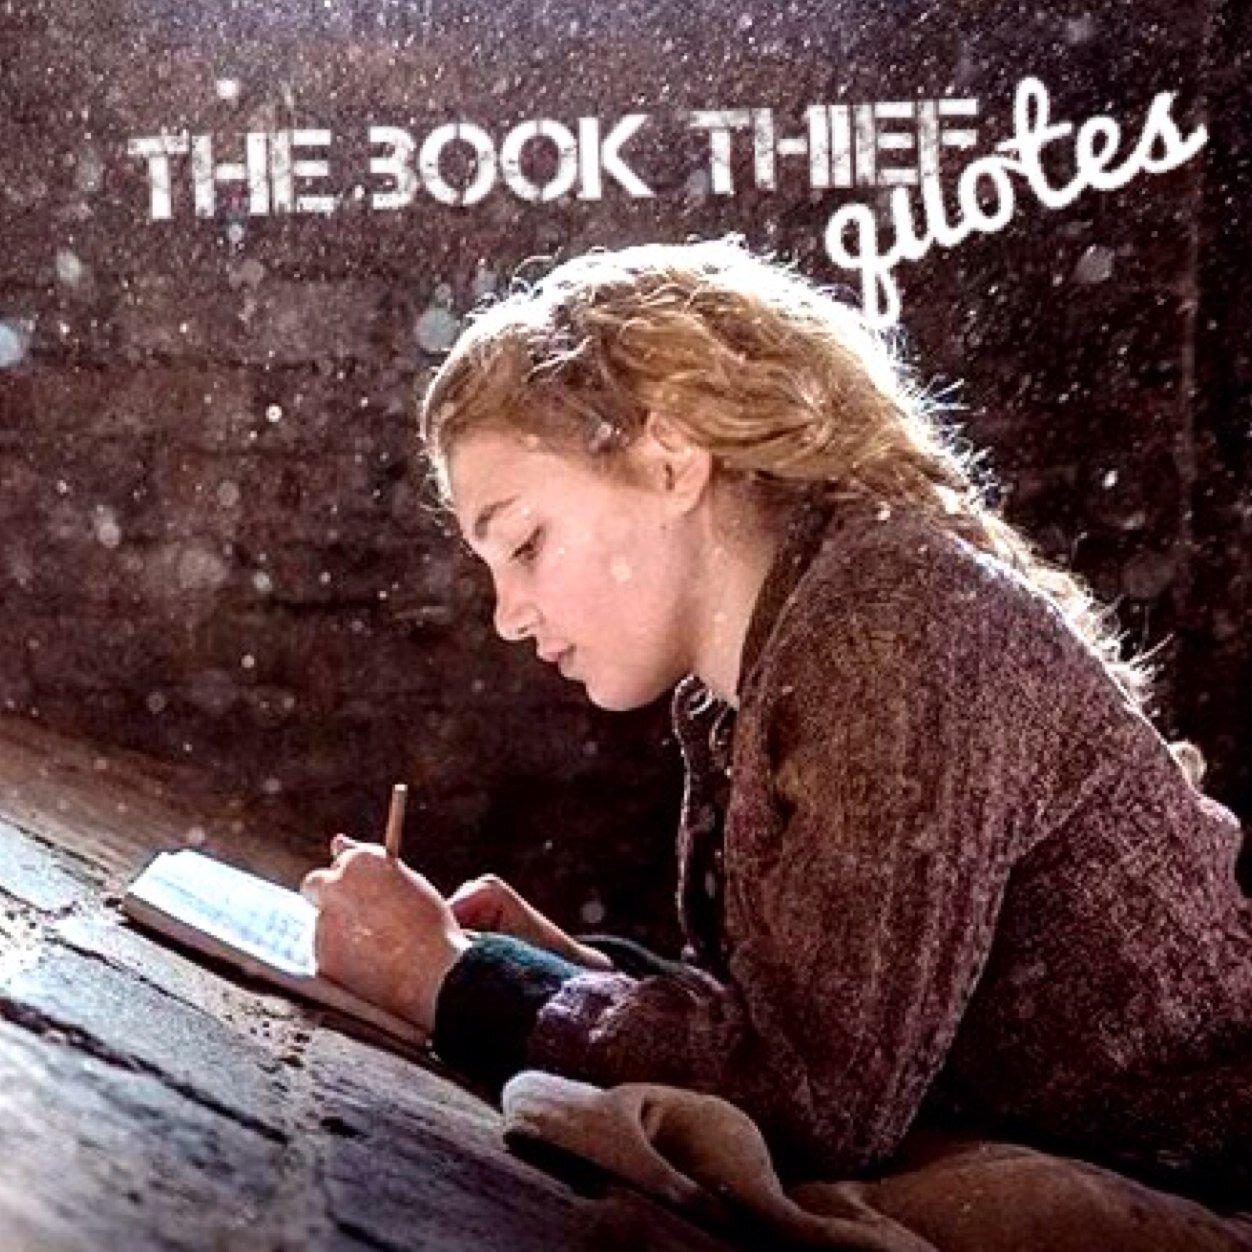 The Book Thief Quotes The Book Thief Quote Bookthiefquotes  Twitter